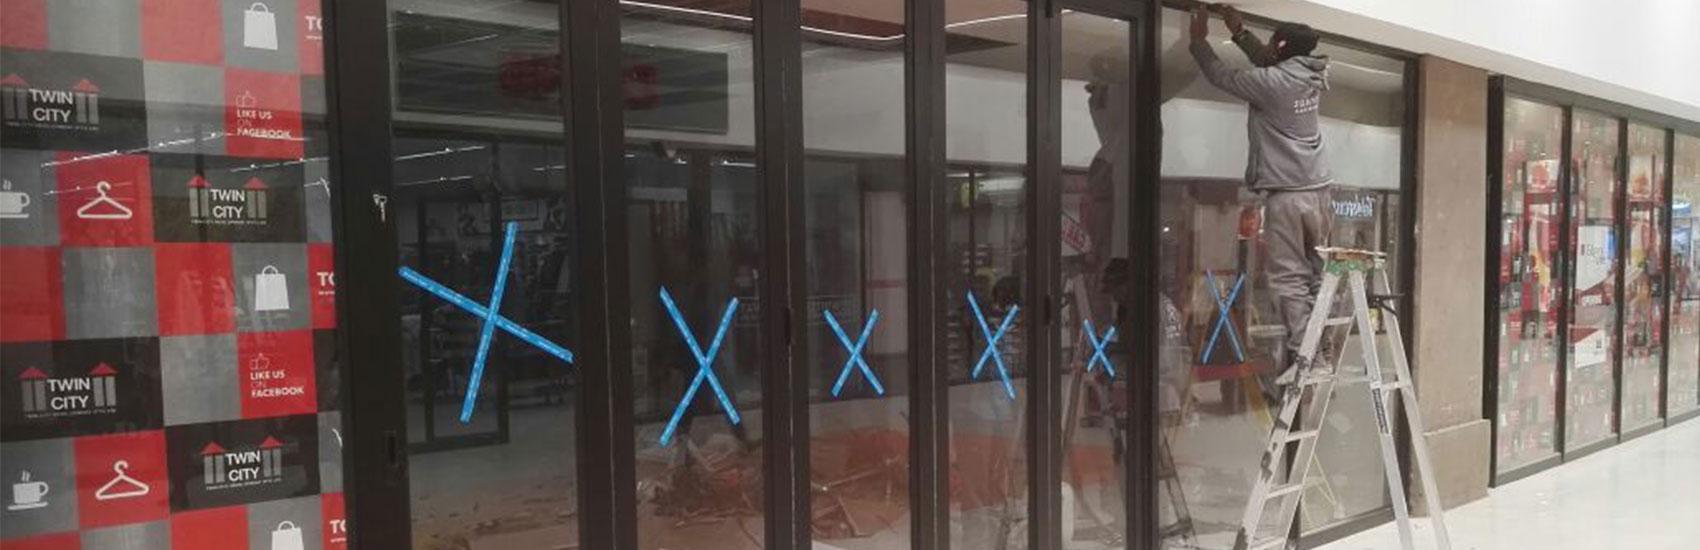 Sonhe-Aluminium-Shop-Fronts-Curtain-Walls-&-Facades-slider